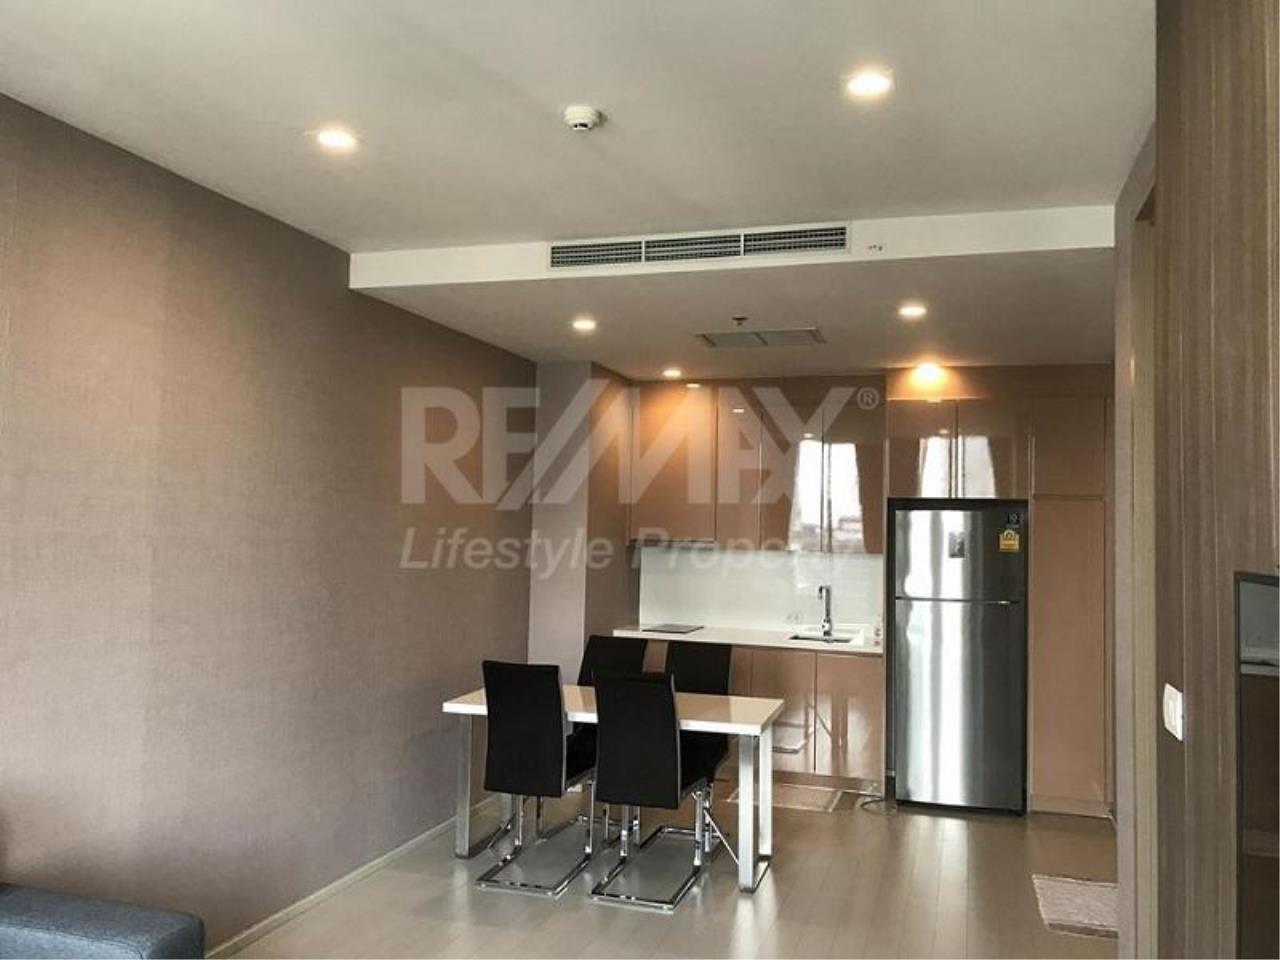 RE/MAX LifeStyle Property Agency's Noble Ploenchit 4